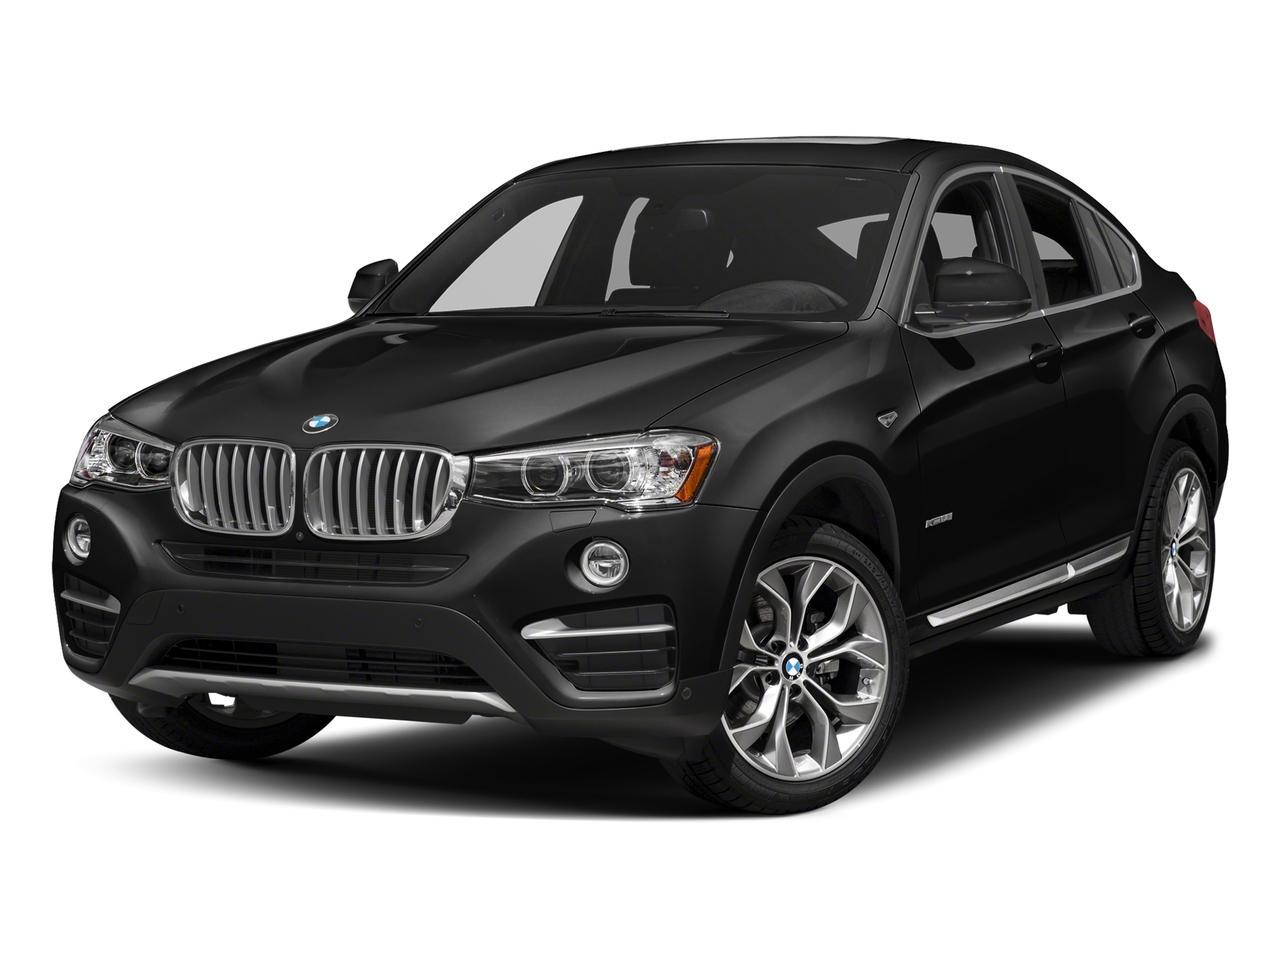 2018 BMW X4 xDrive28i Vehicle Photo in Tulsa, OK 74133